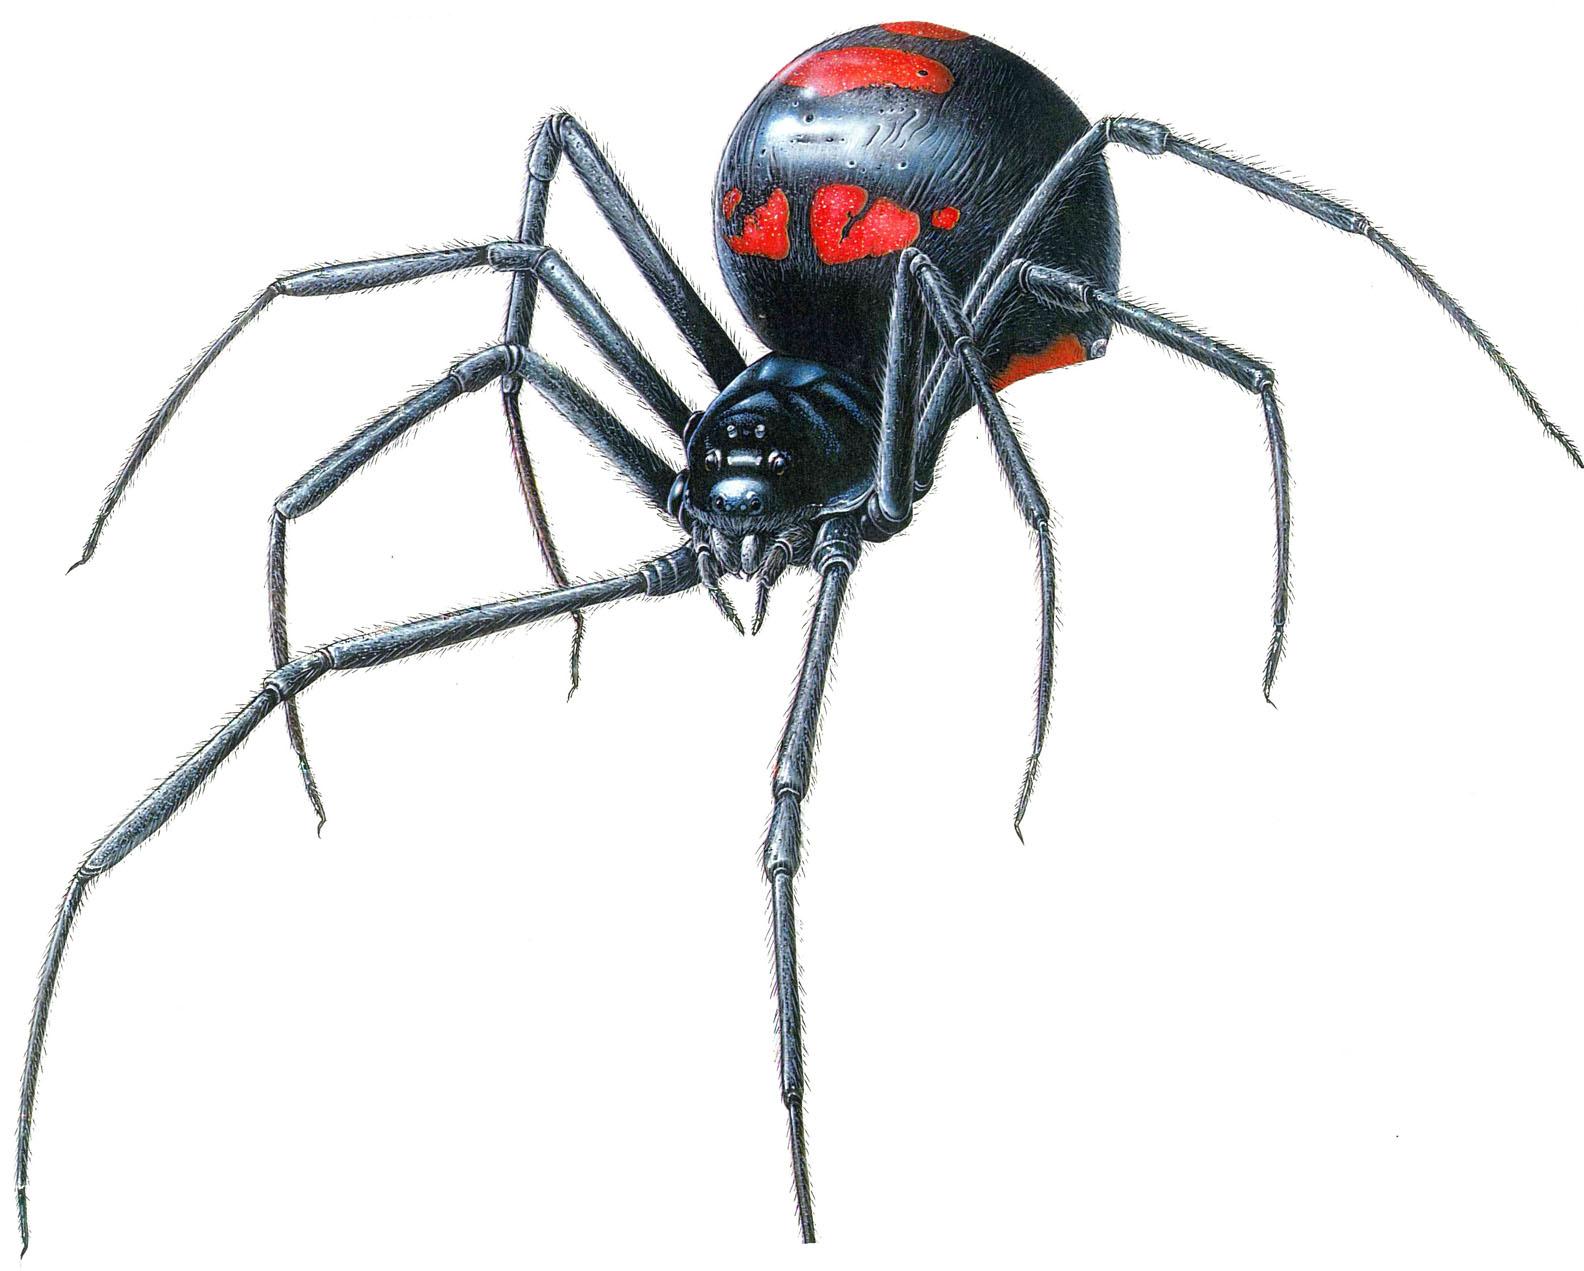 Black spider drawing